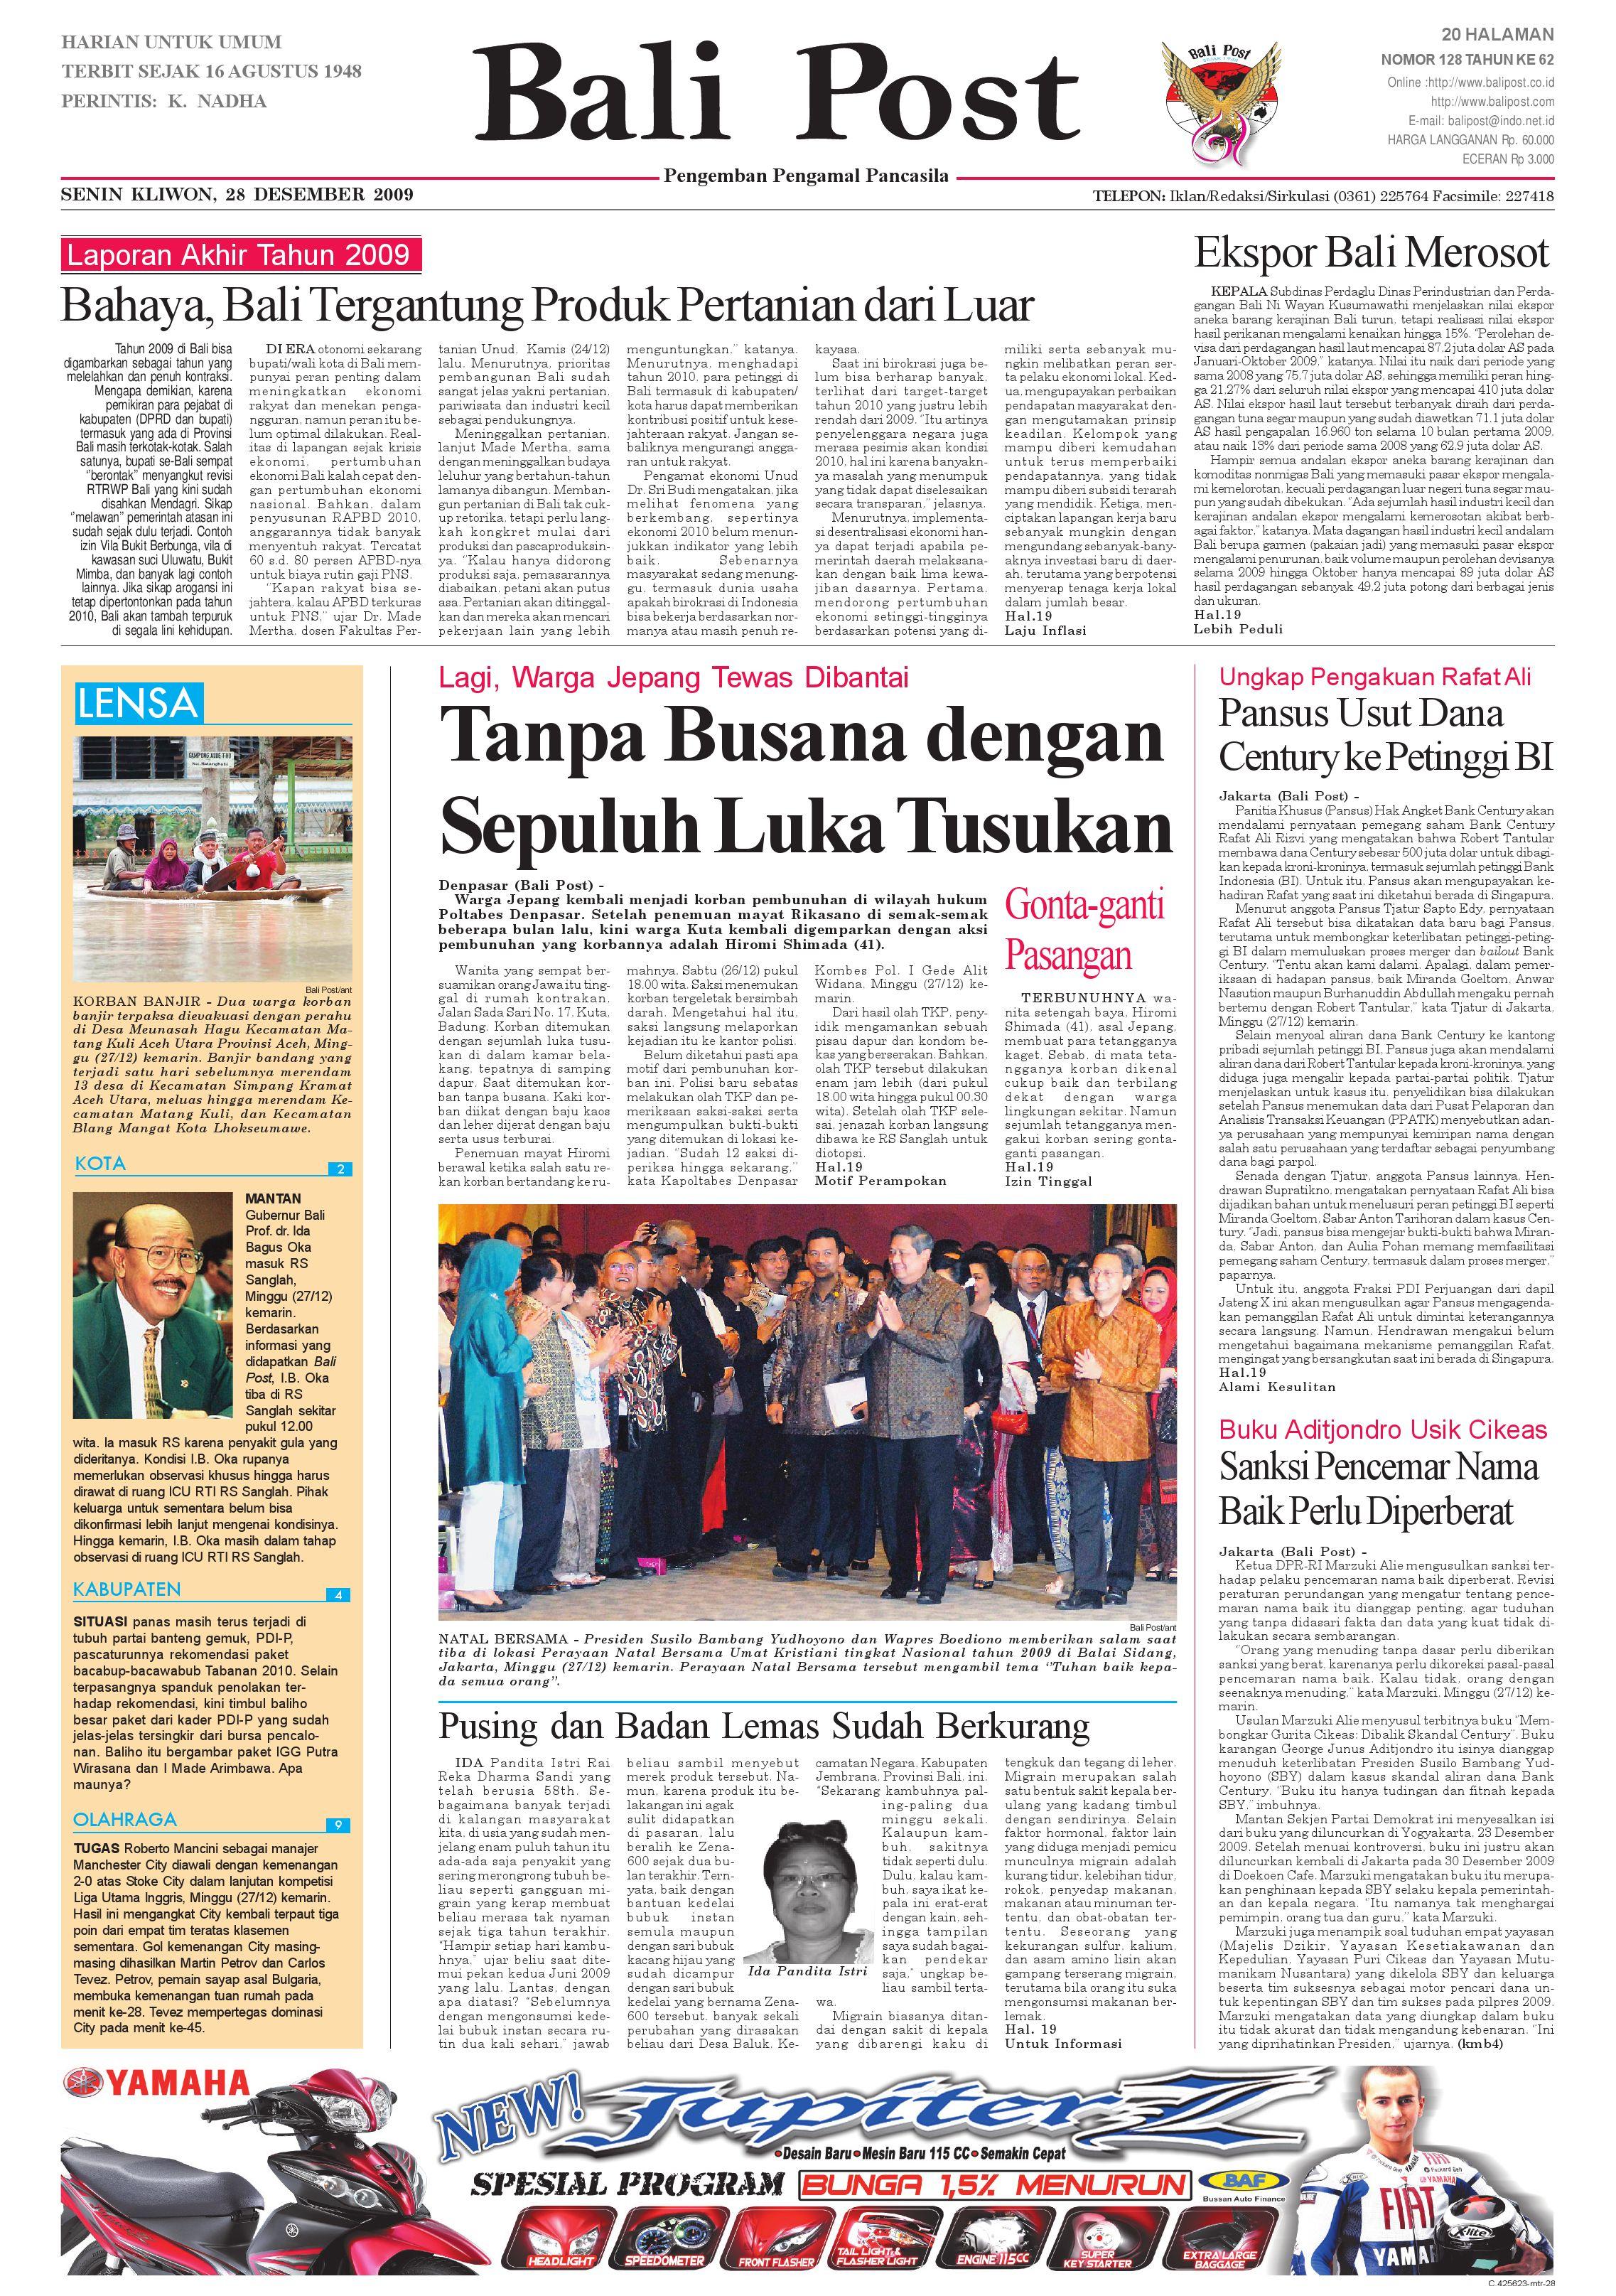 Edisi 28 Desember 2009 Balipostcom By E Paper Kmb Issuu Produk Ukm Bumn Bakso Ikan Tuna Khas Ambon